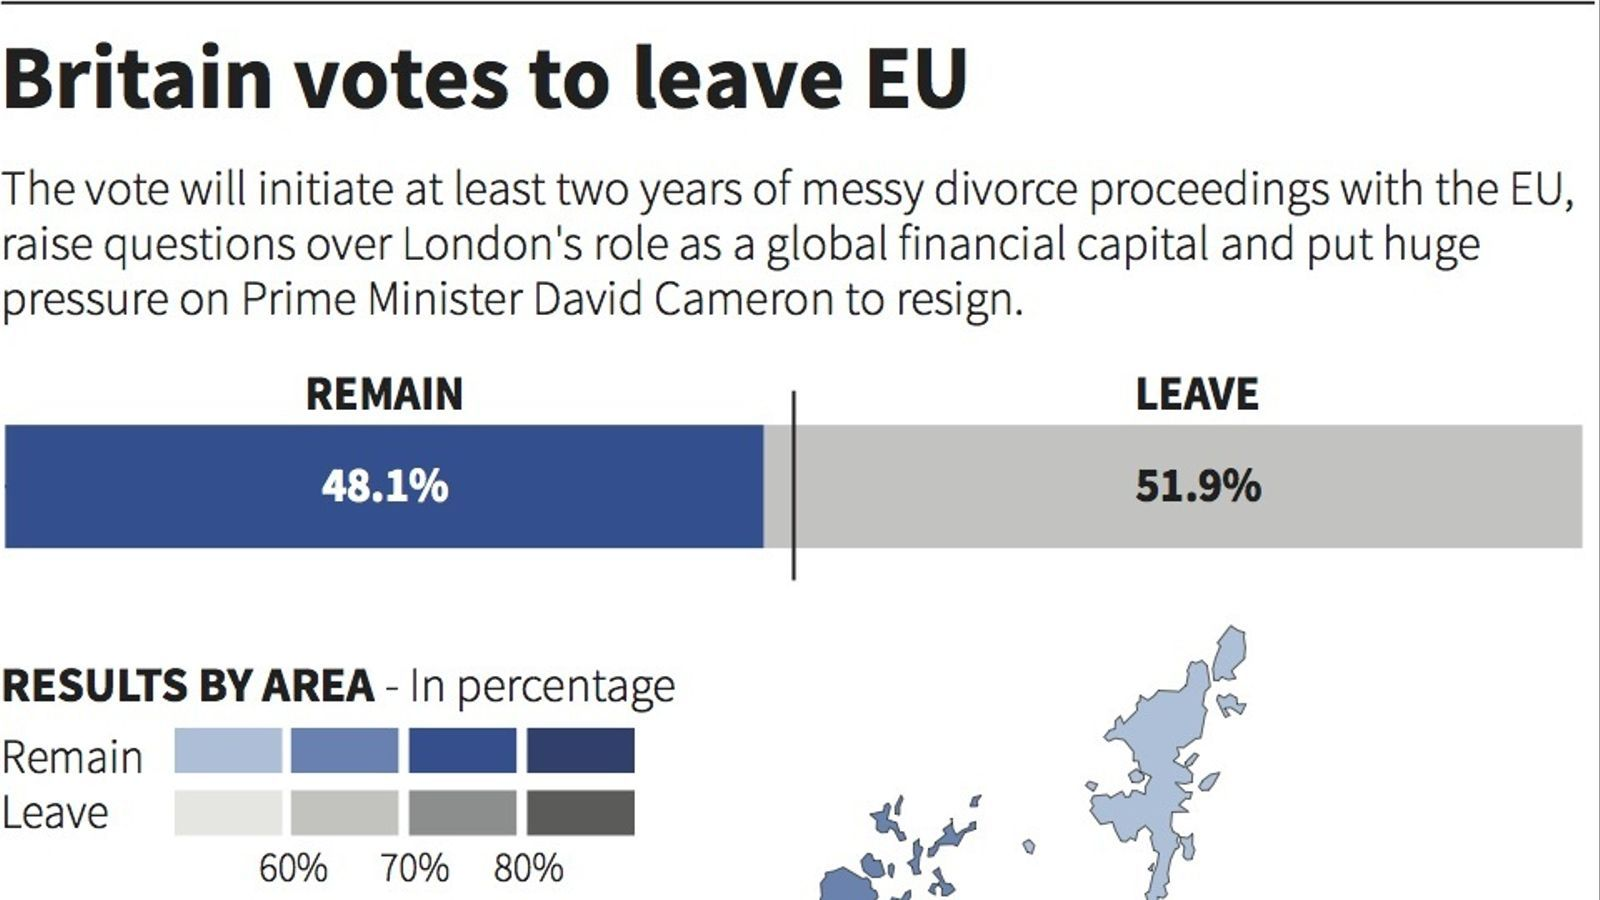 Resultats del referèndum.